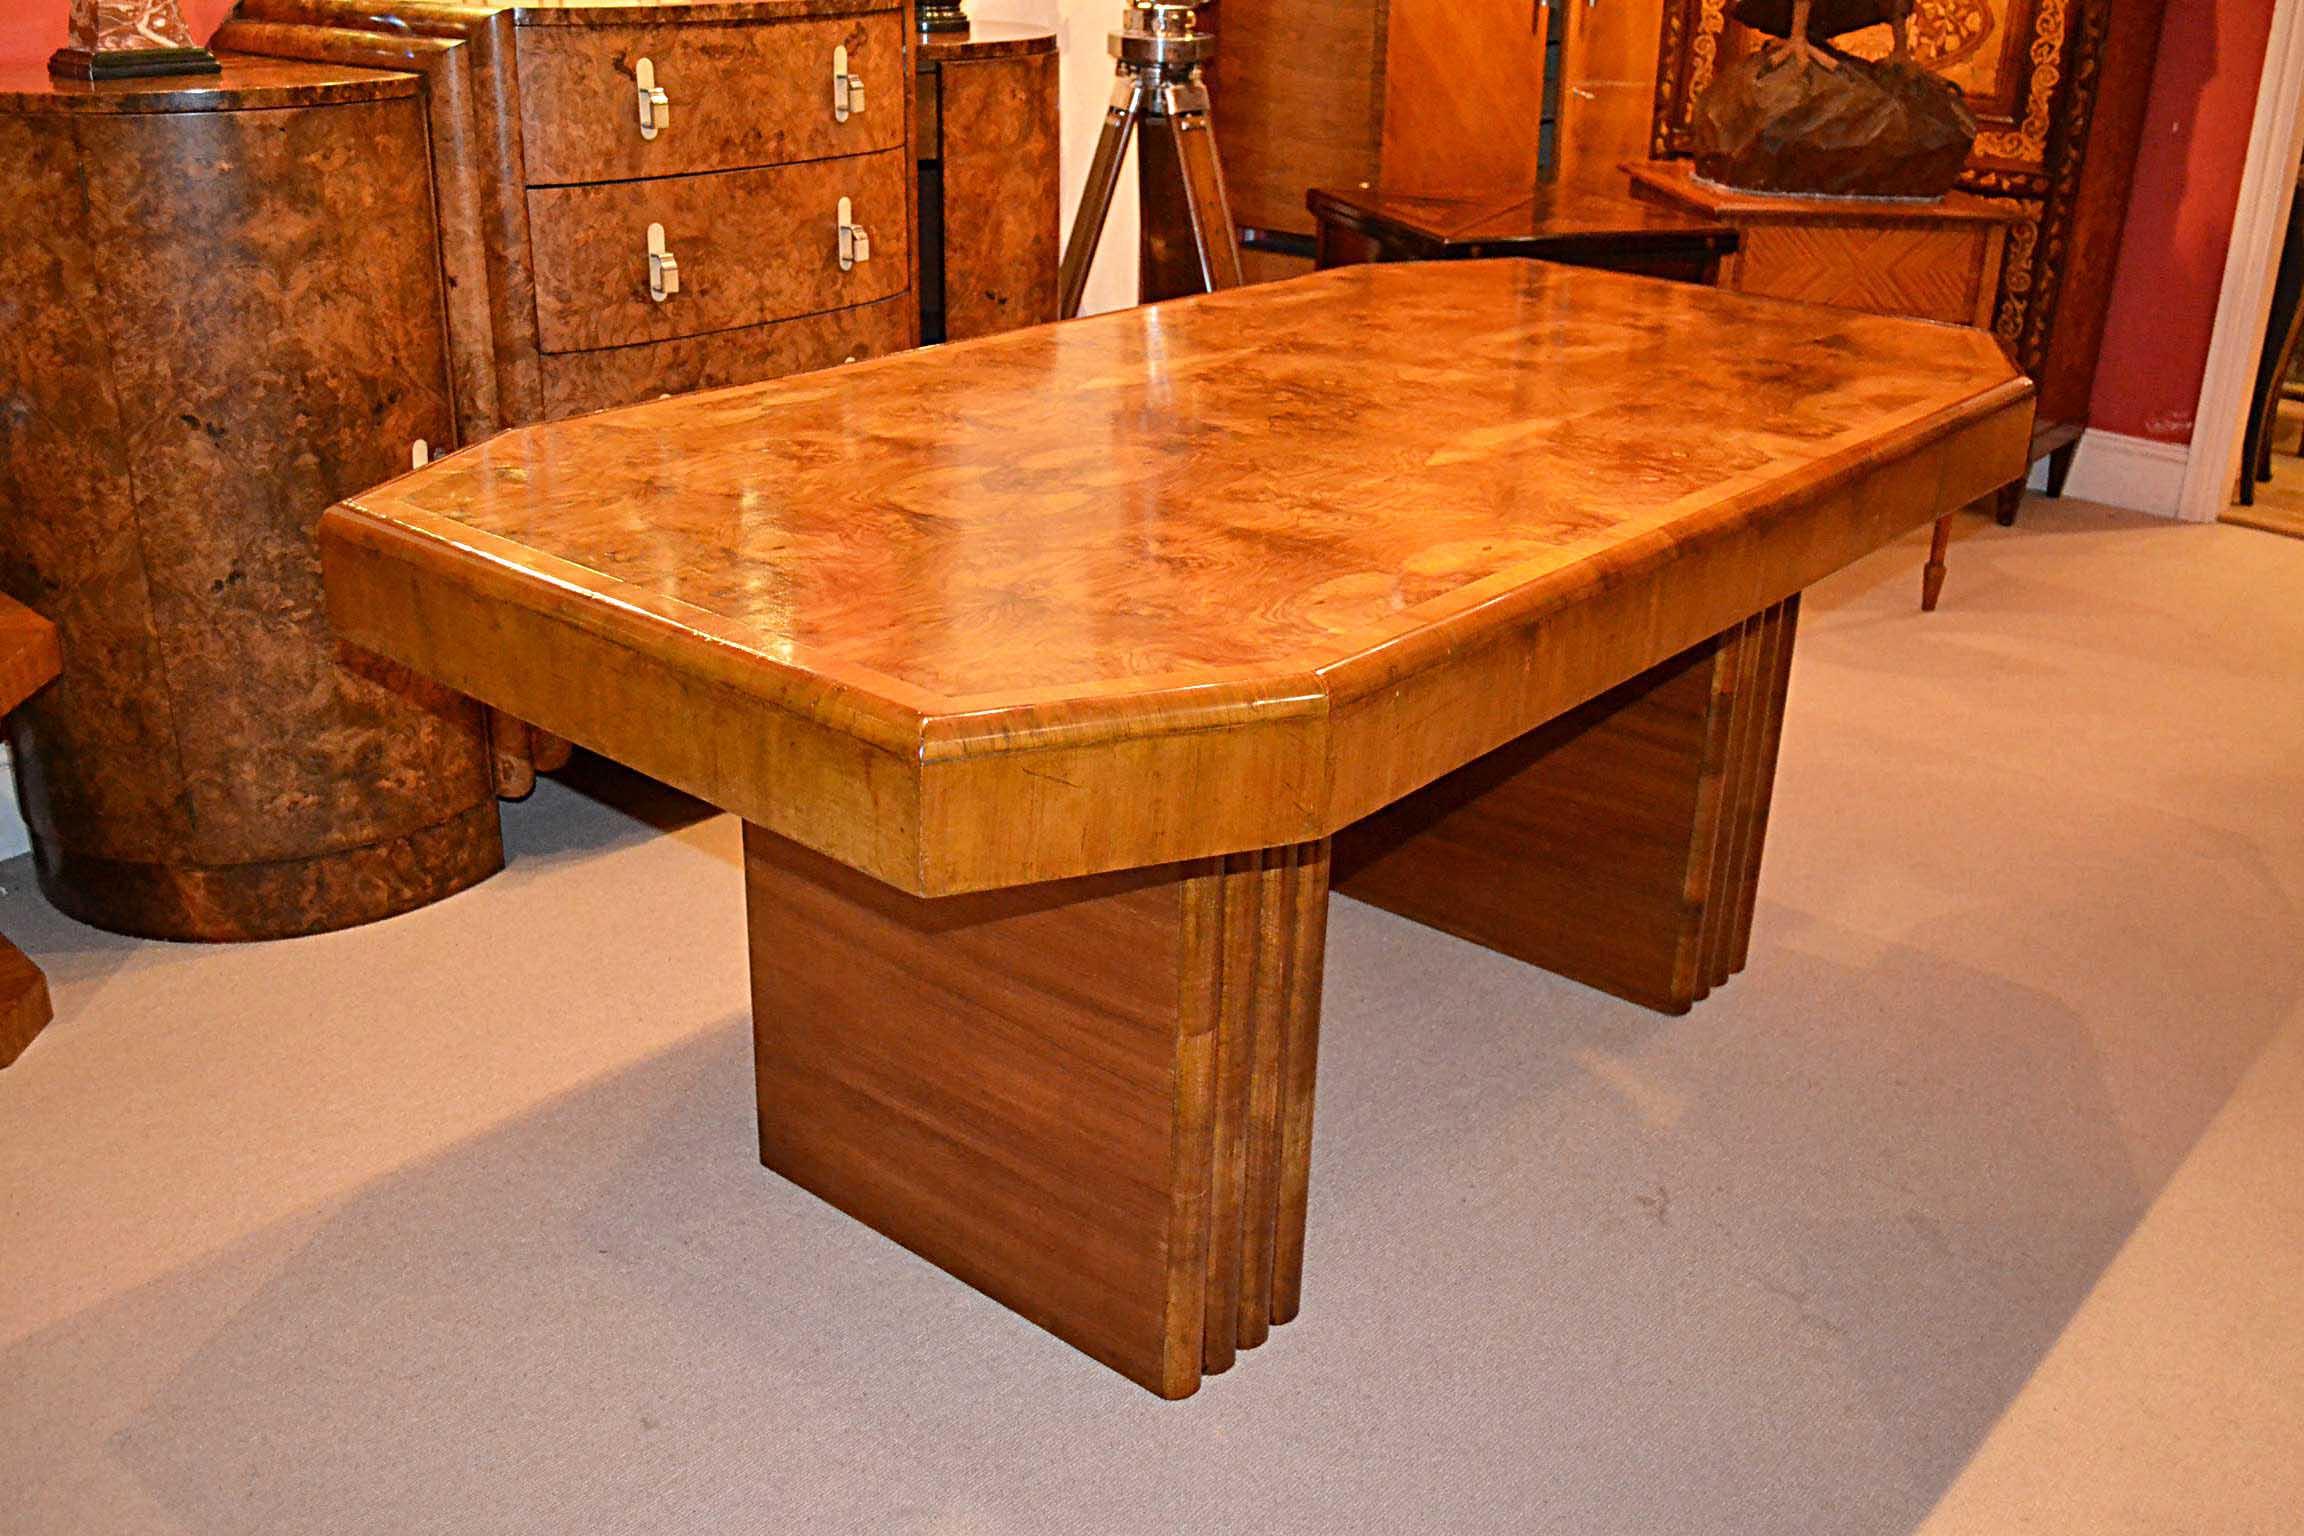 antique art deco walnut dining table c1920 ref no 03725. Black Bedroom Furniture Sets. Home Design Ideas